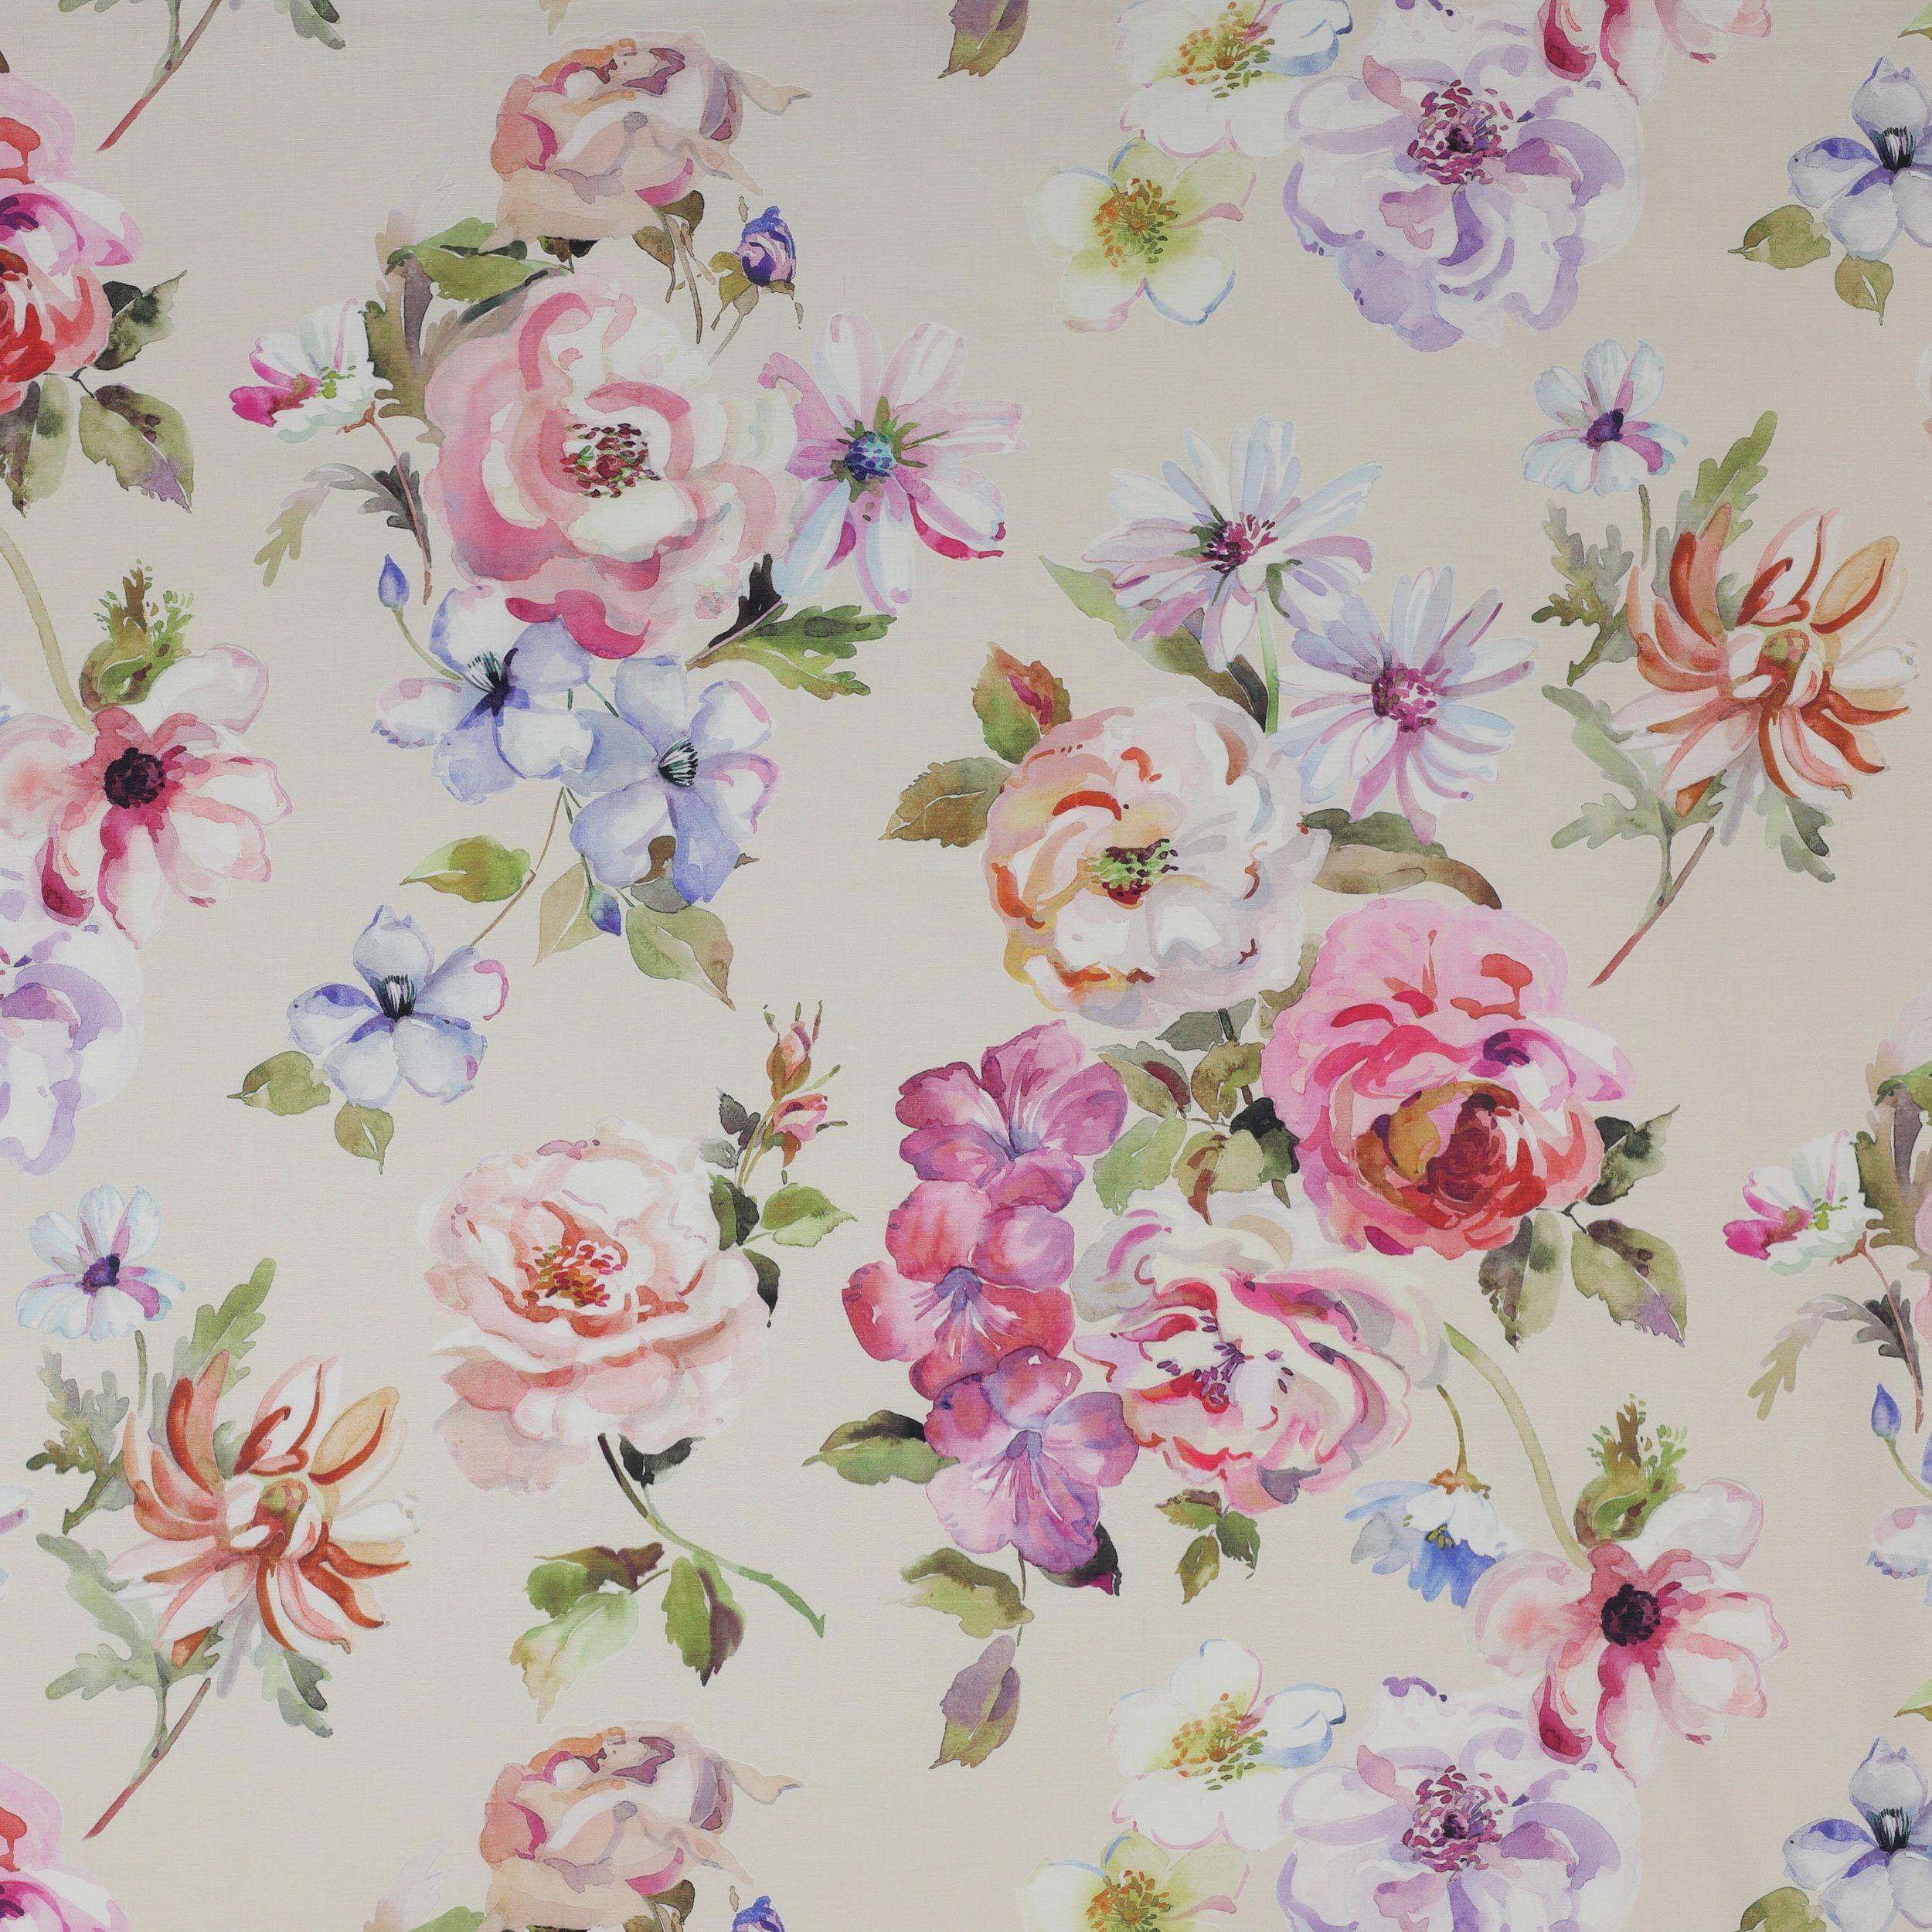 Mayflower Fabric Jane Churchill Floral Art Floral Prints Pattern Watercolor Pattern